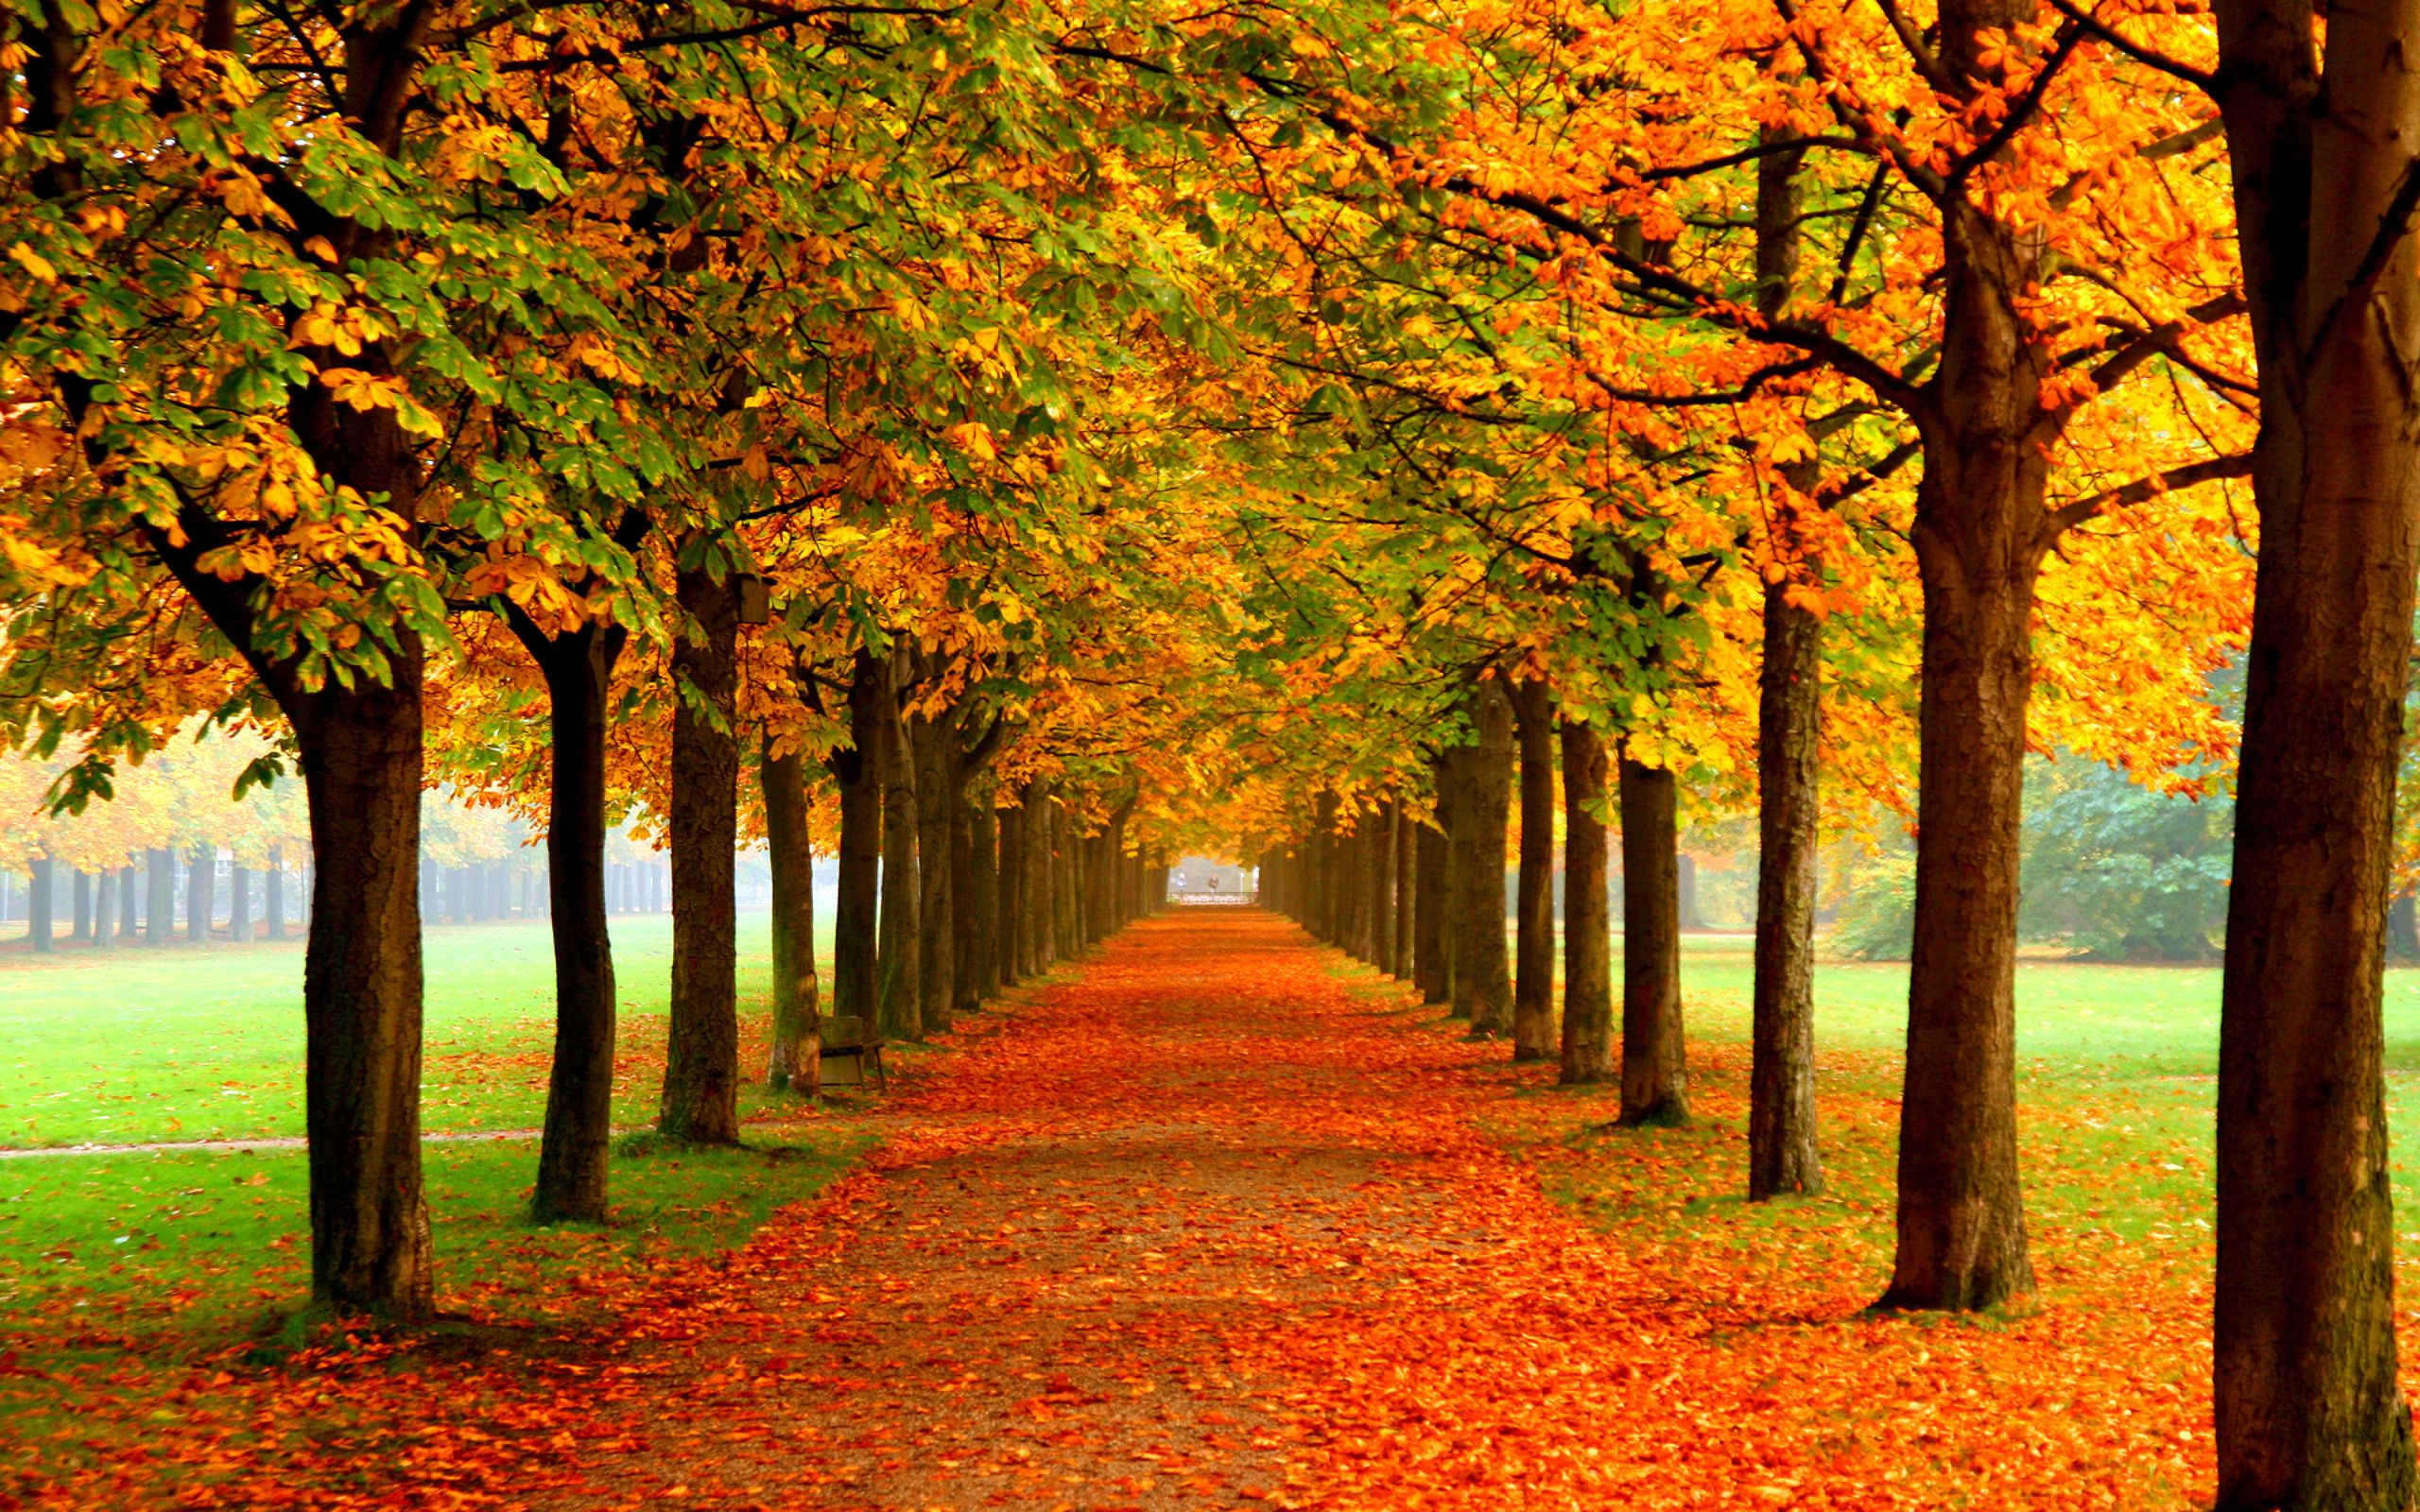 2560x1600 Erde Natur Herbst Wallpaper Autumn Trees Colorful